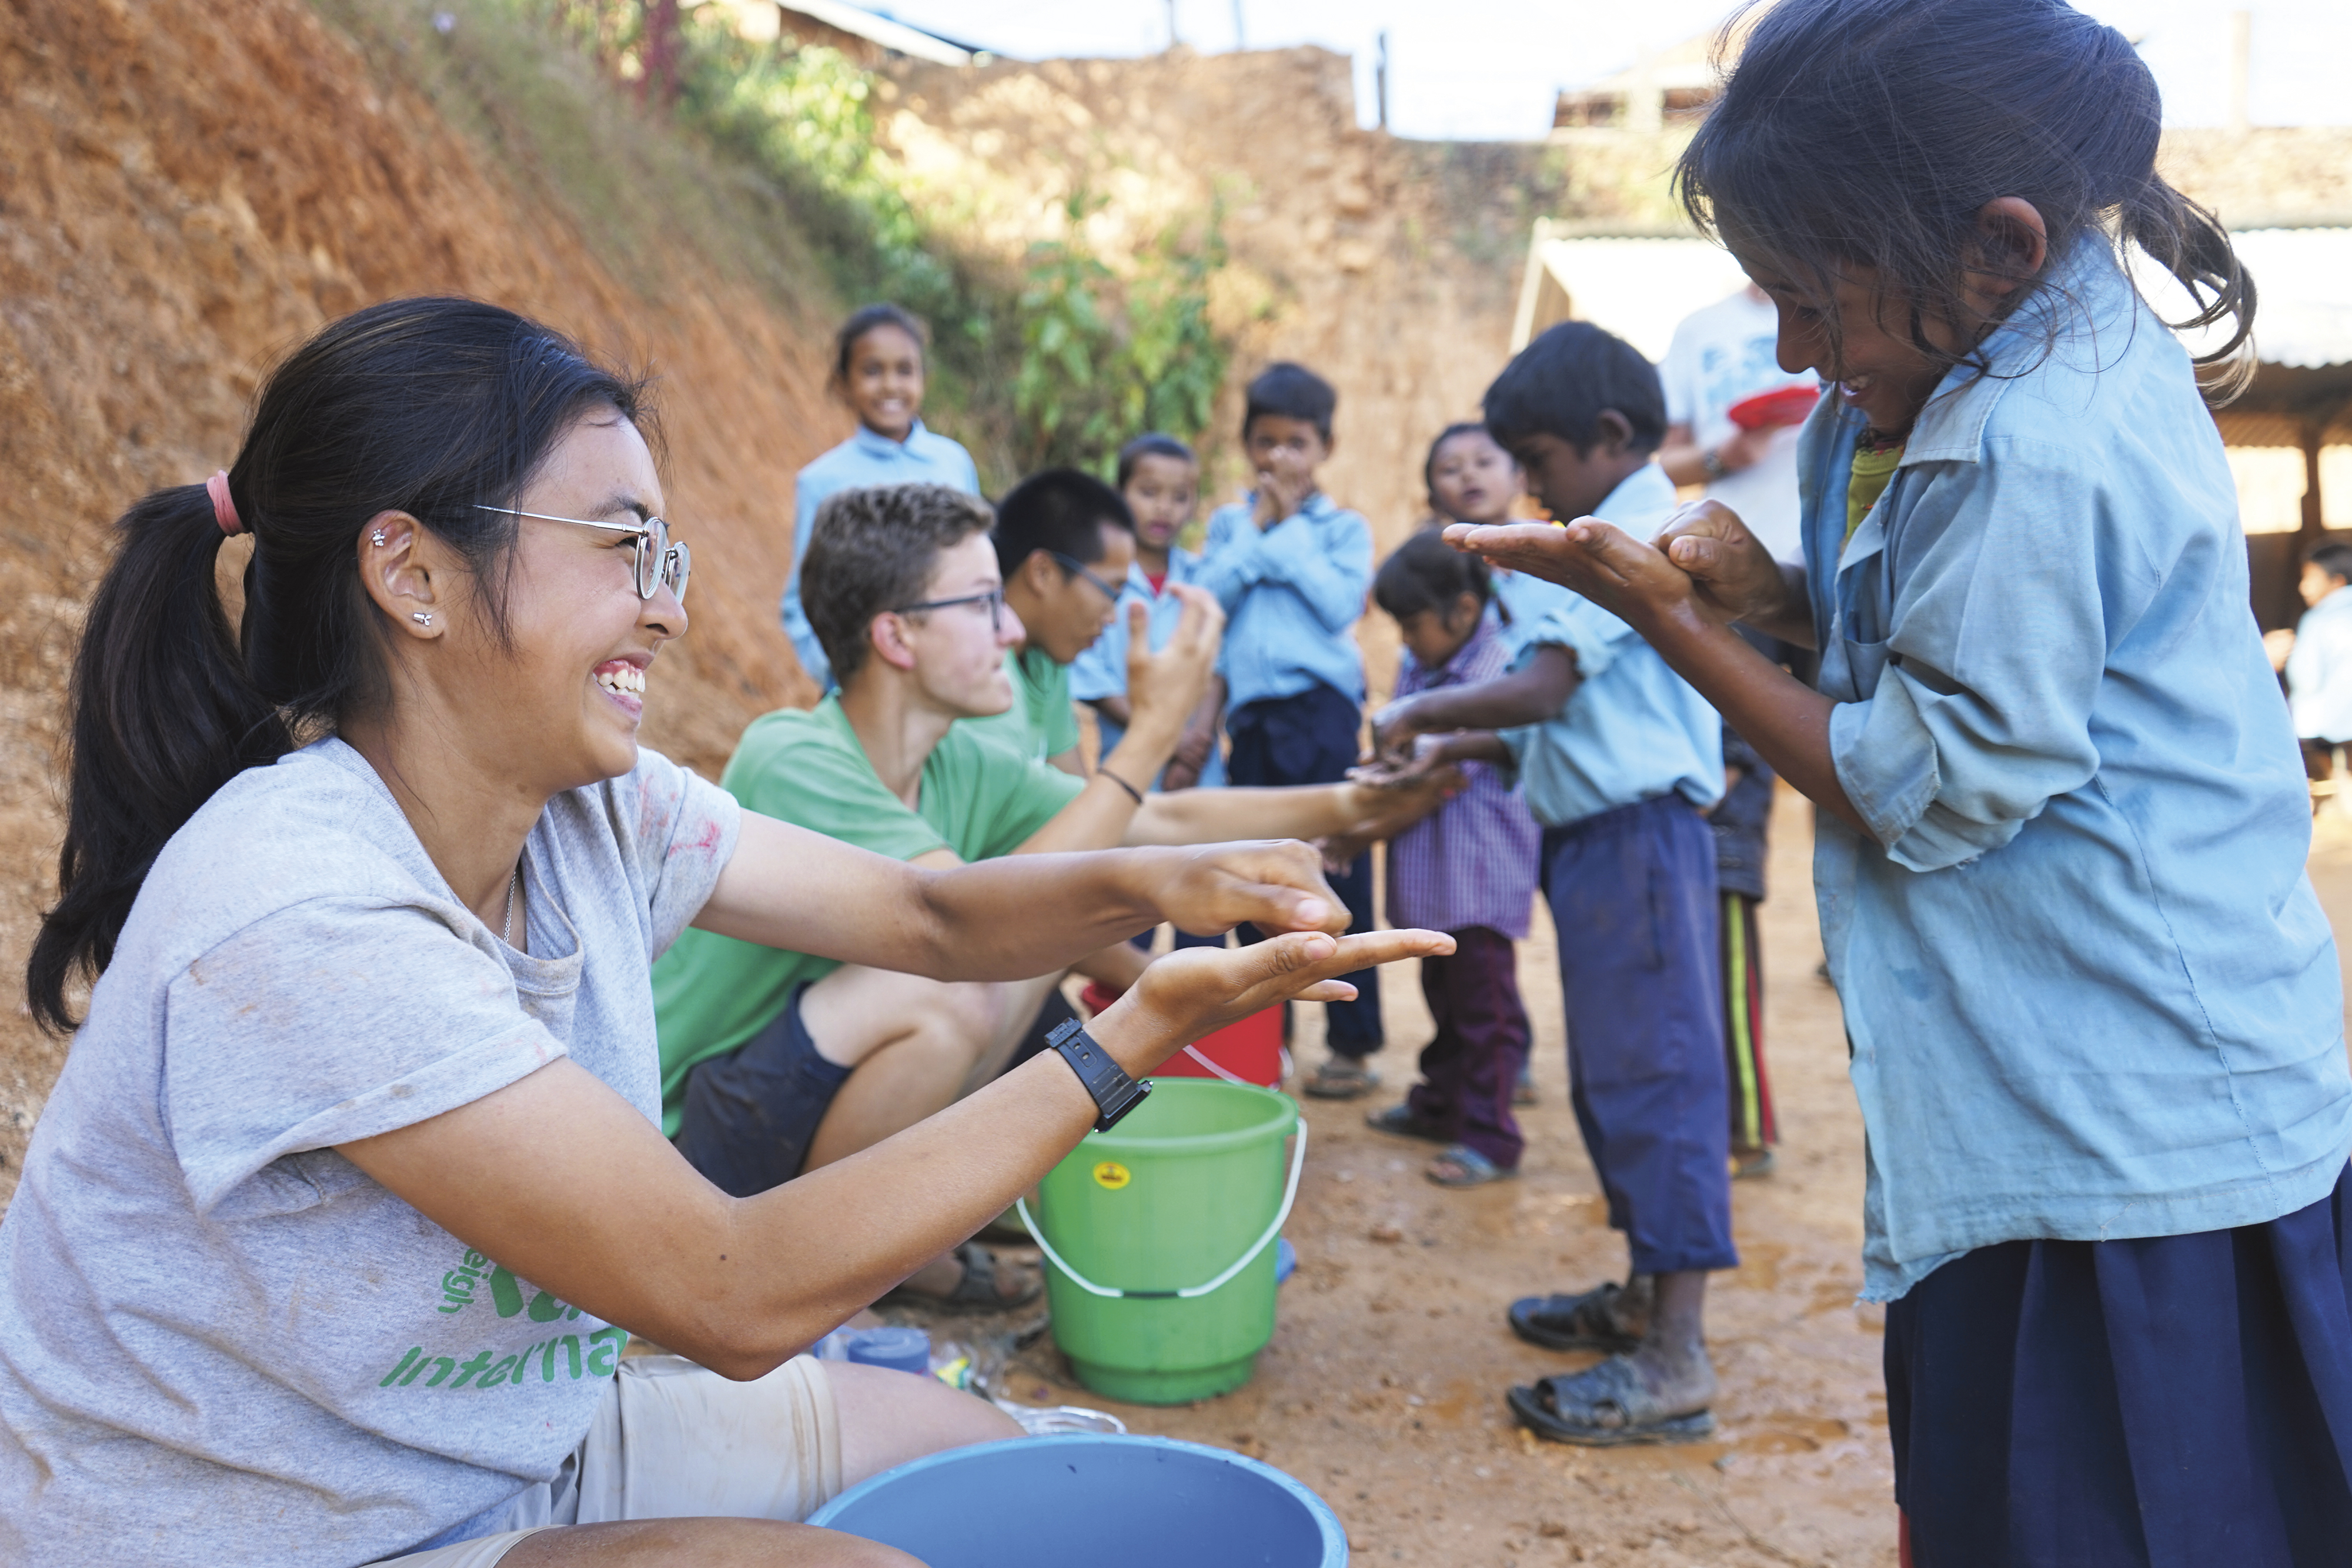 Summer Program - Community Resources | Raleigh International - Summer 2020 Travel Abroad Program in Nepal